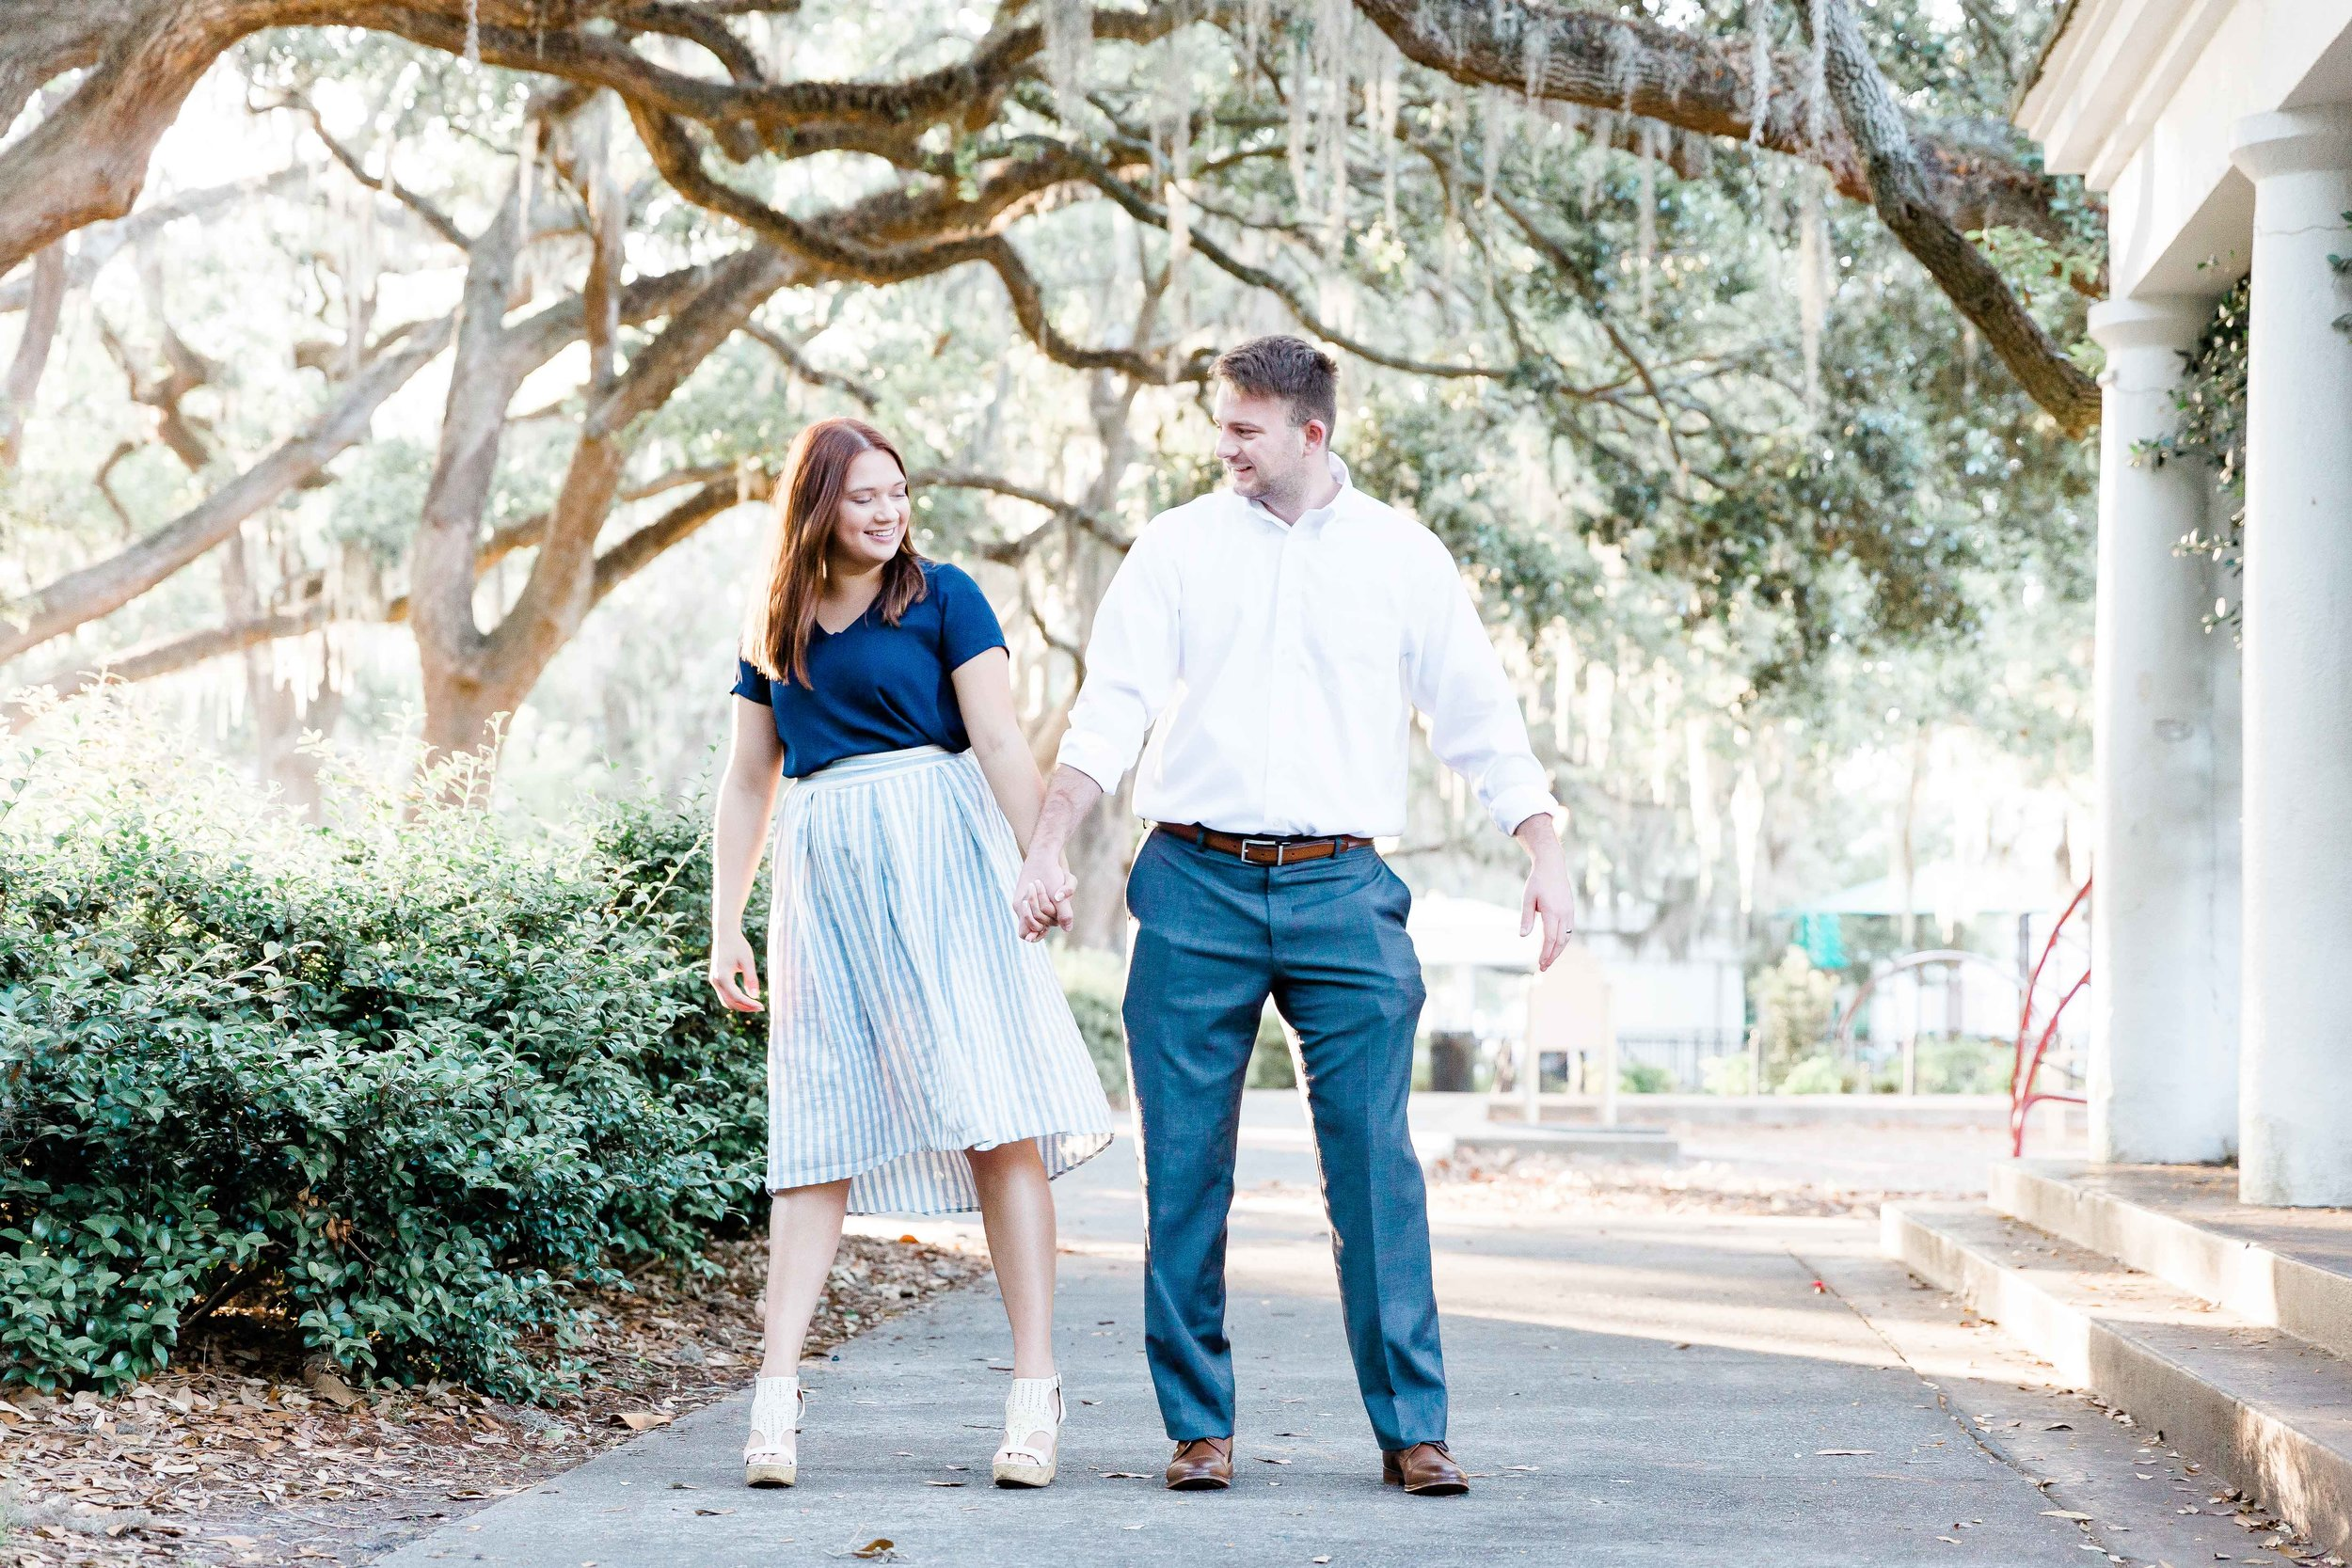 20190519Georgia-Savannah-Kristen & Zach-Forsyth Park-Lafayette Square07.jpg